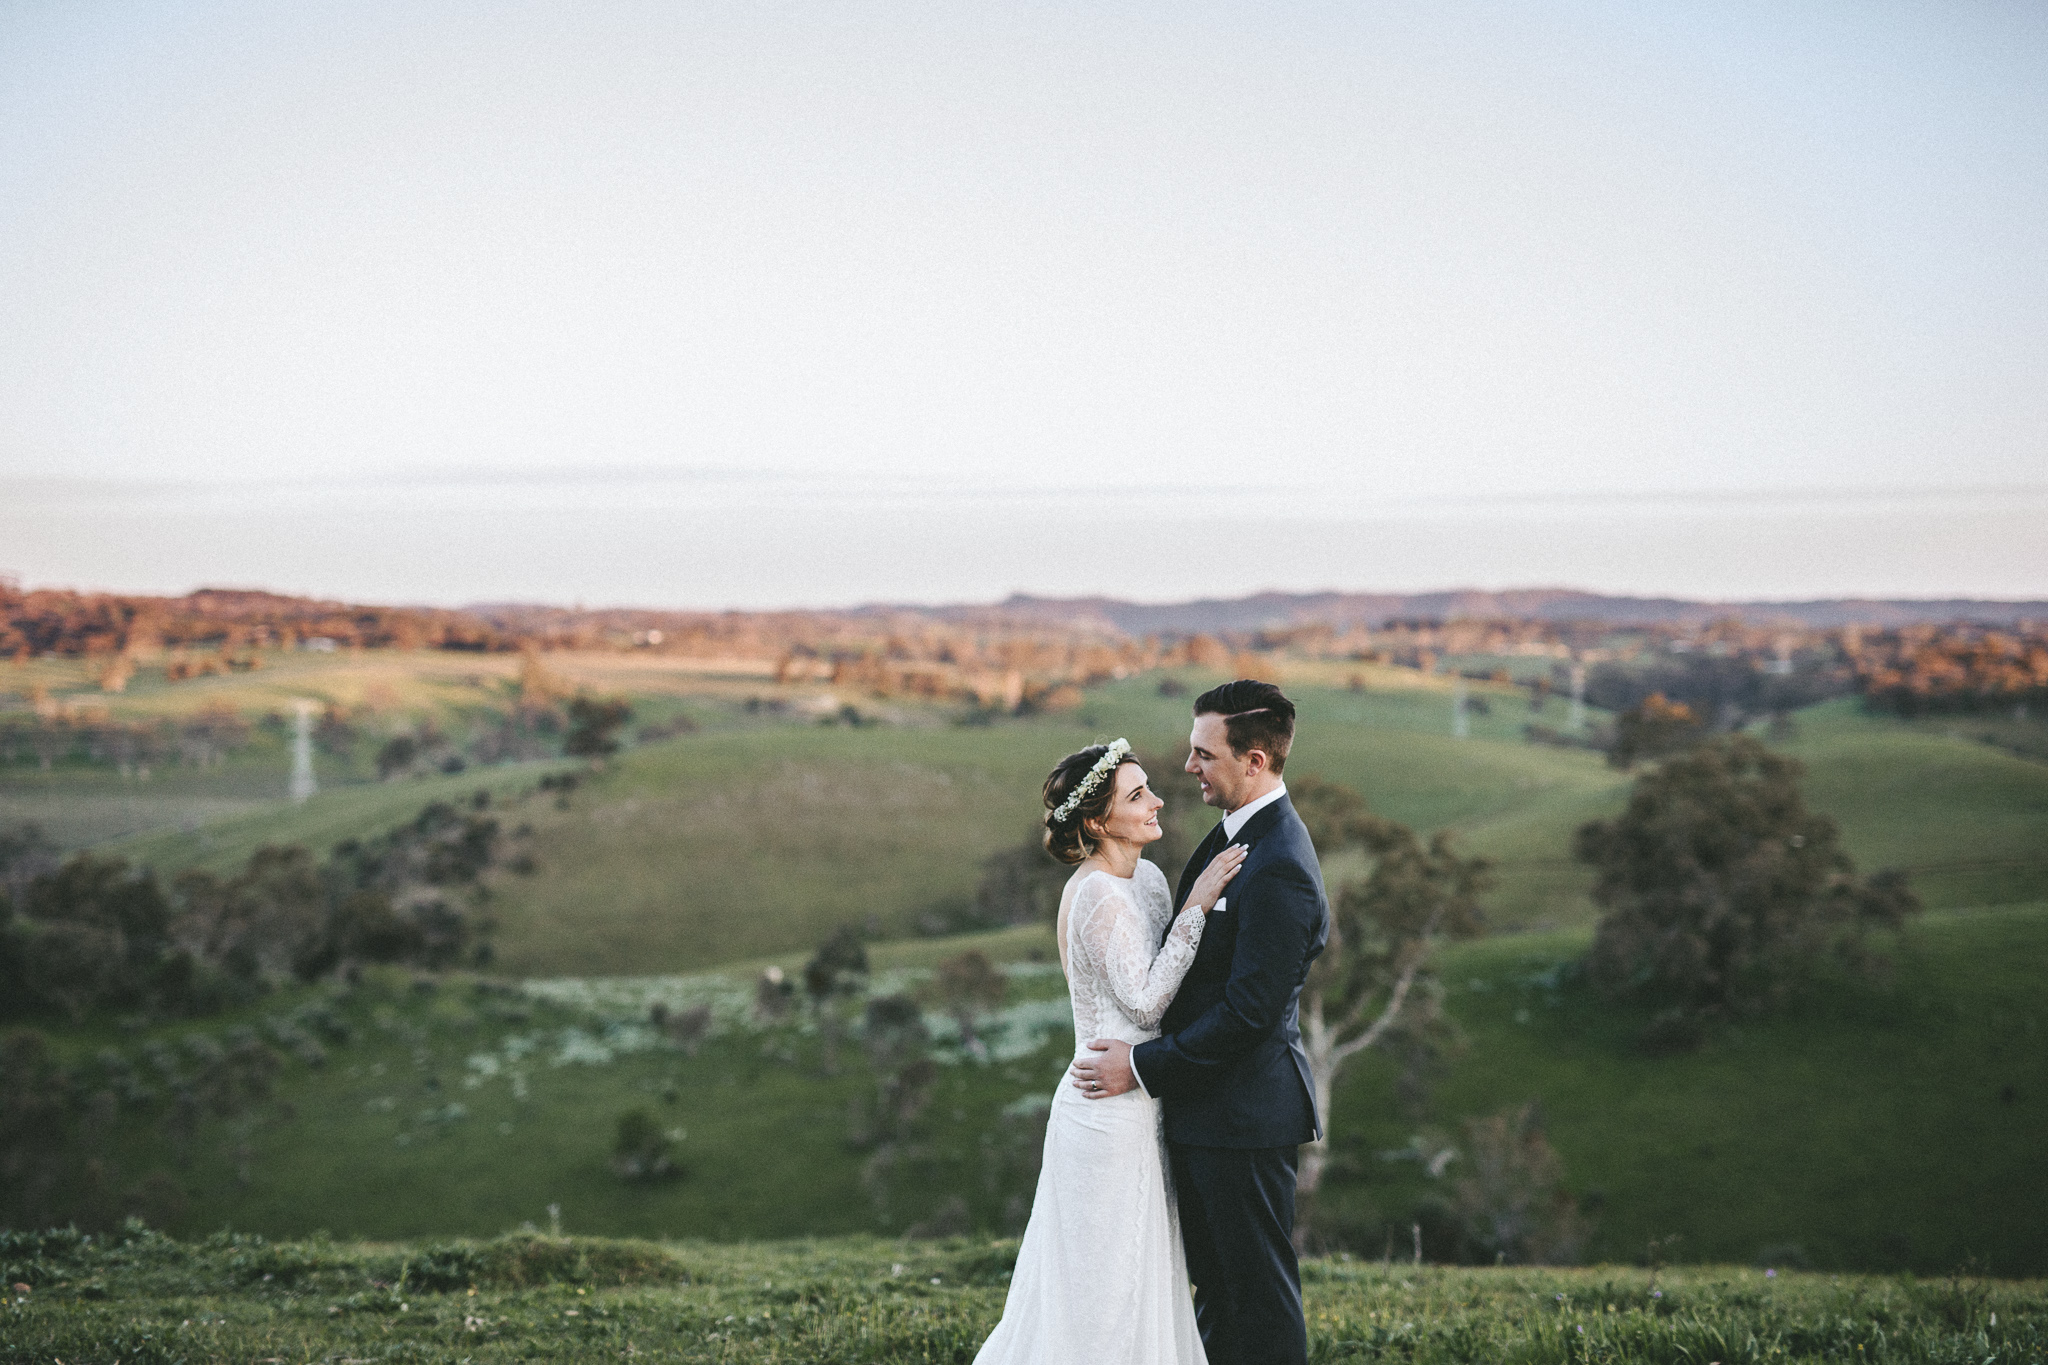 christopher morrison_adelaide hills wedding_ andy + teegan_83_1040.jpg